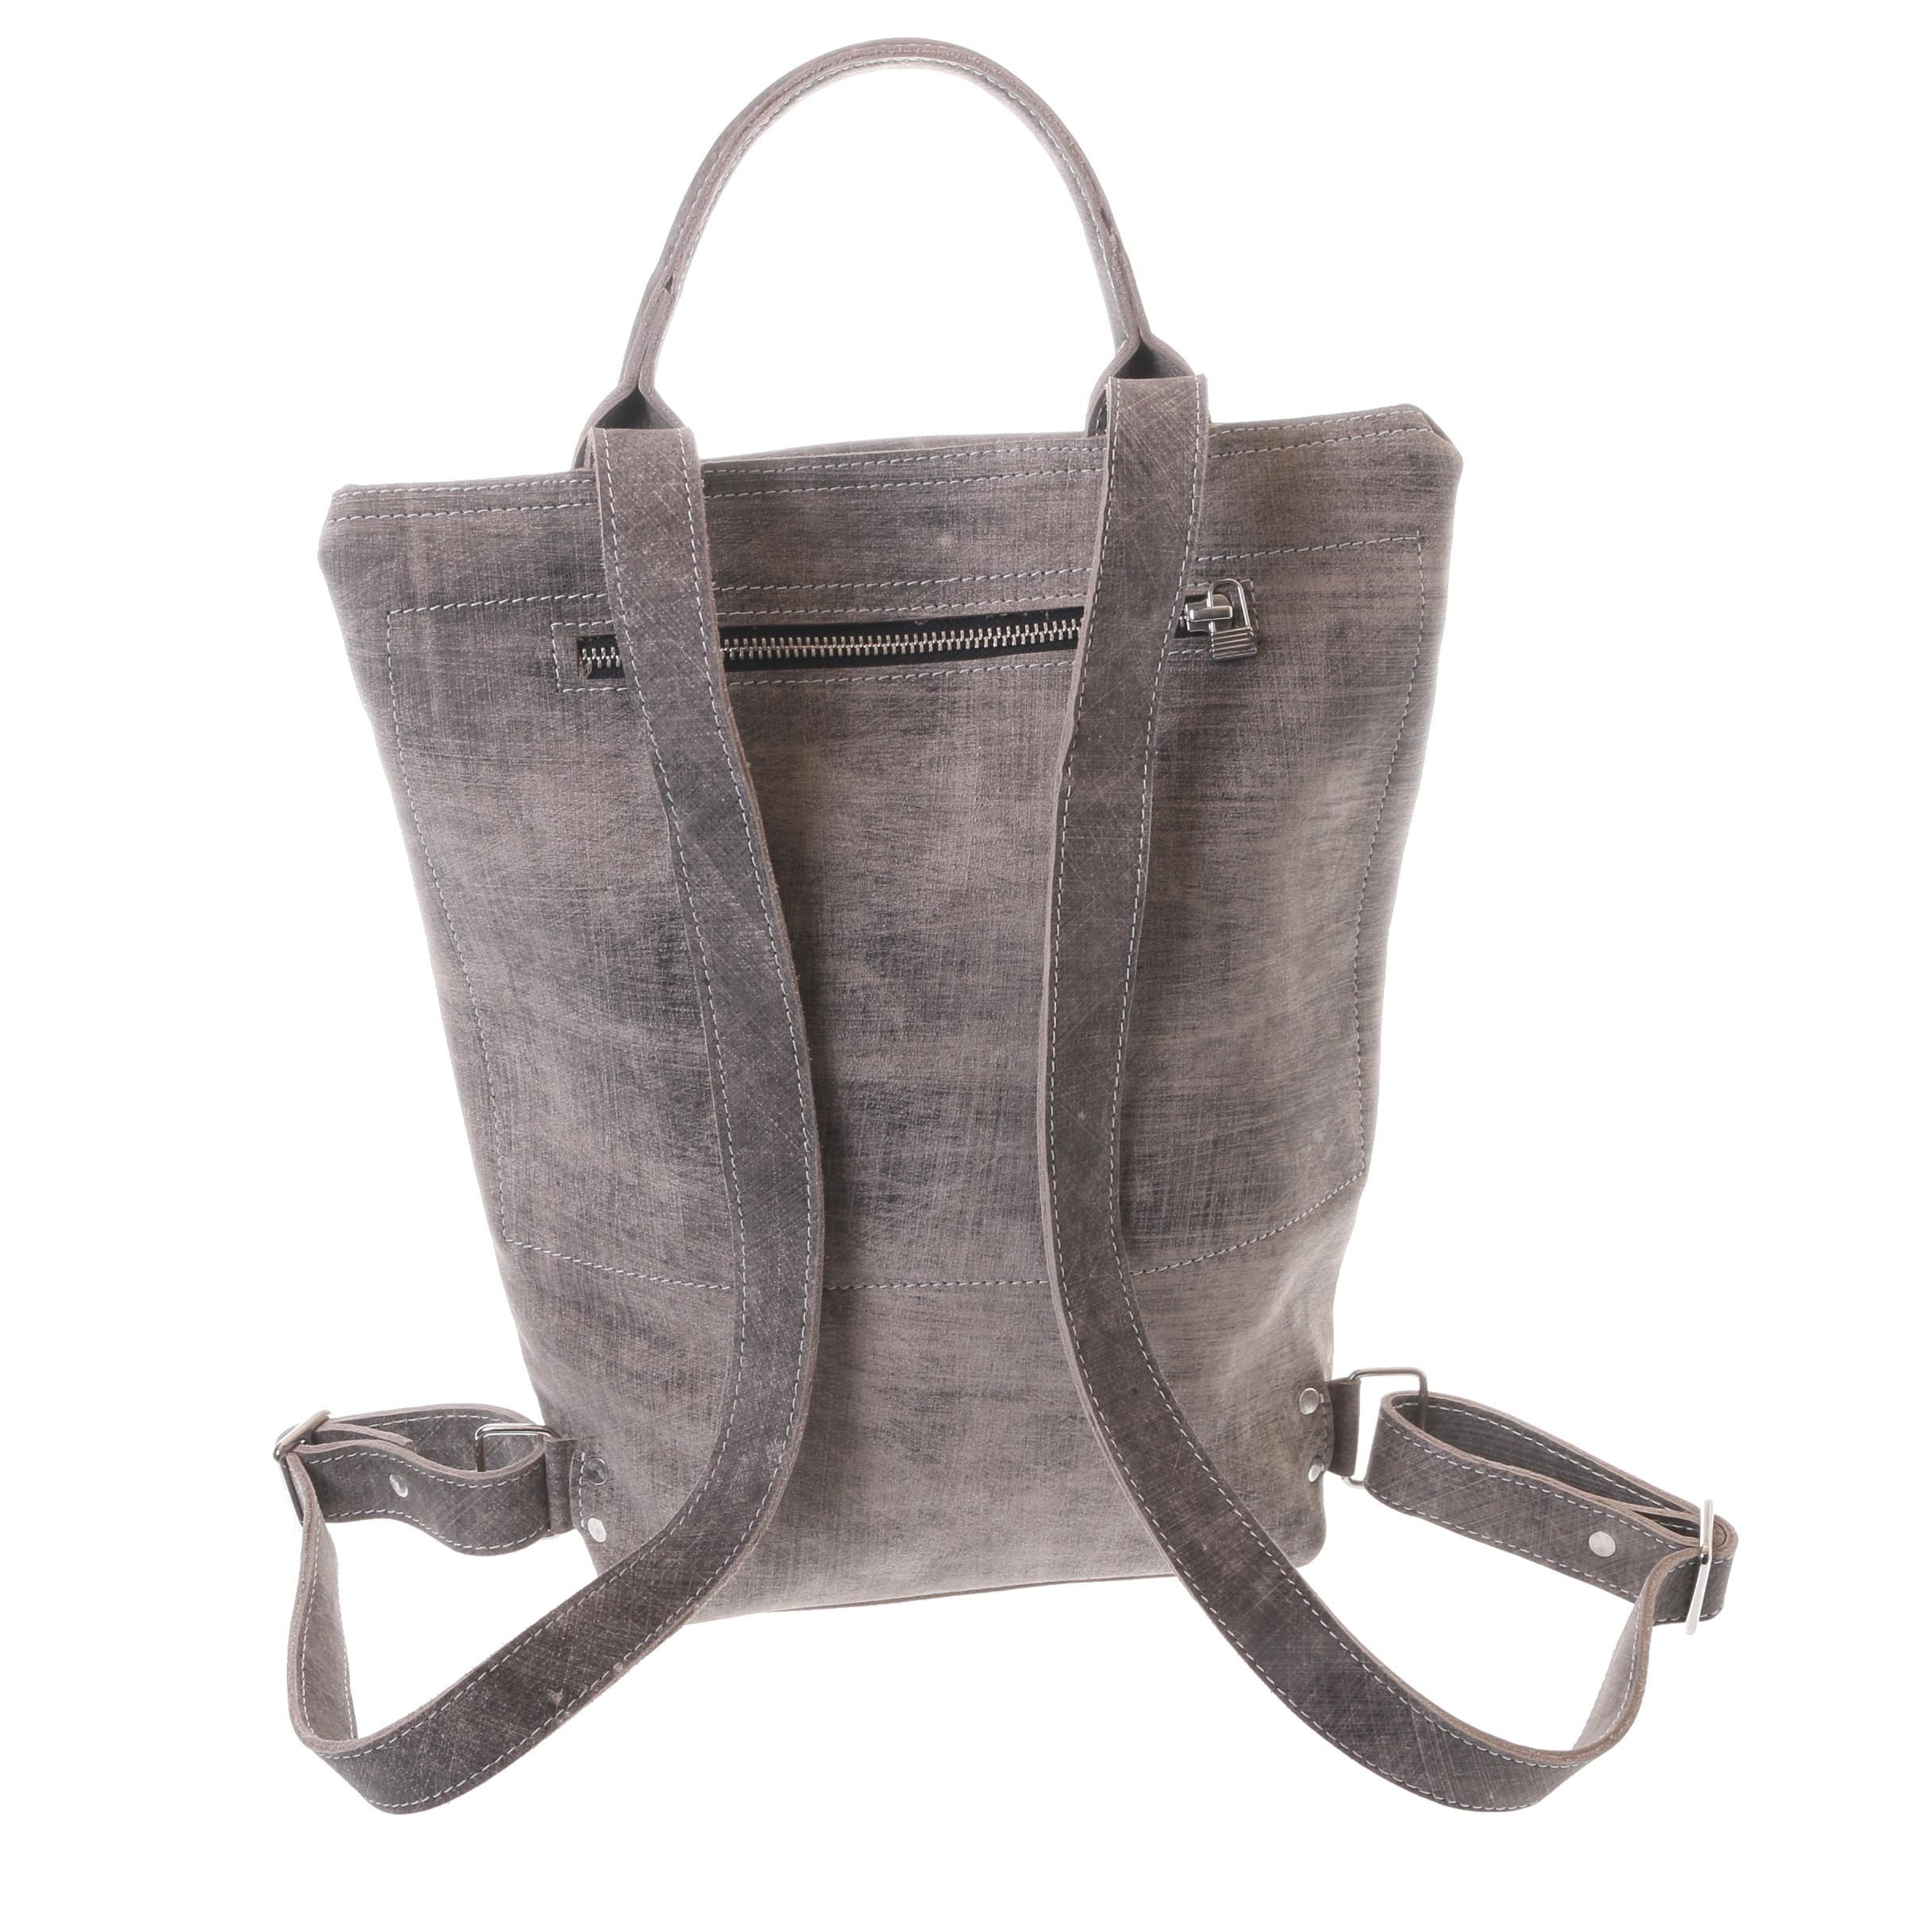 Gundara - fairtrade backpack - grey-scratch cow hide - handmade & fair from Ethiopia